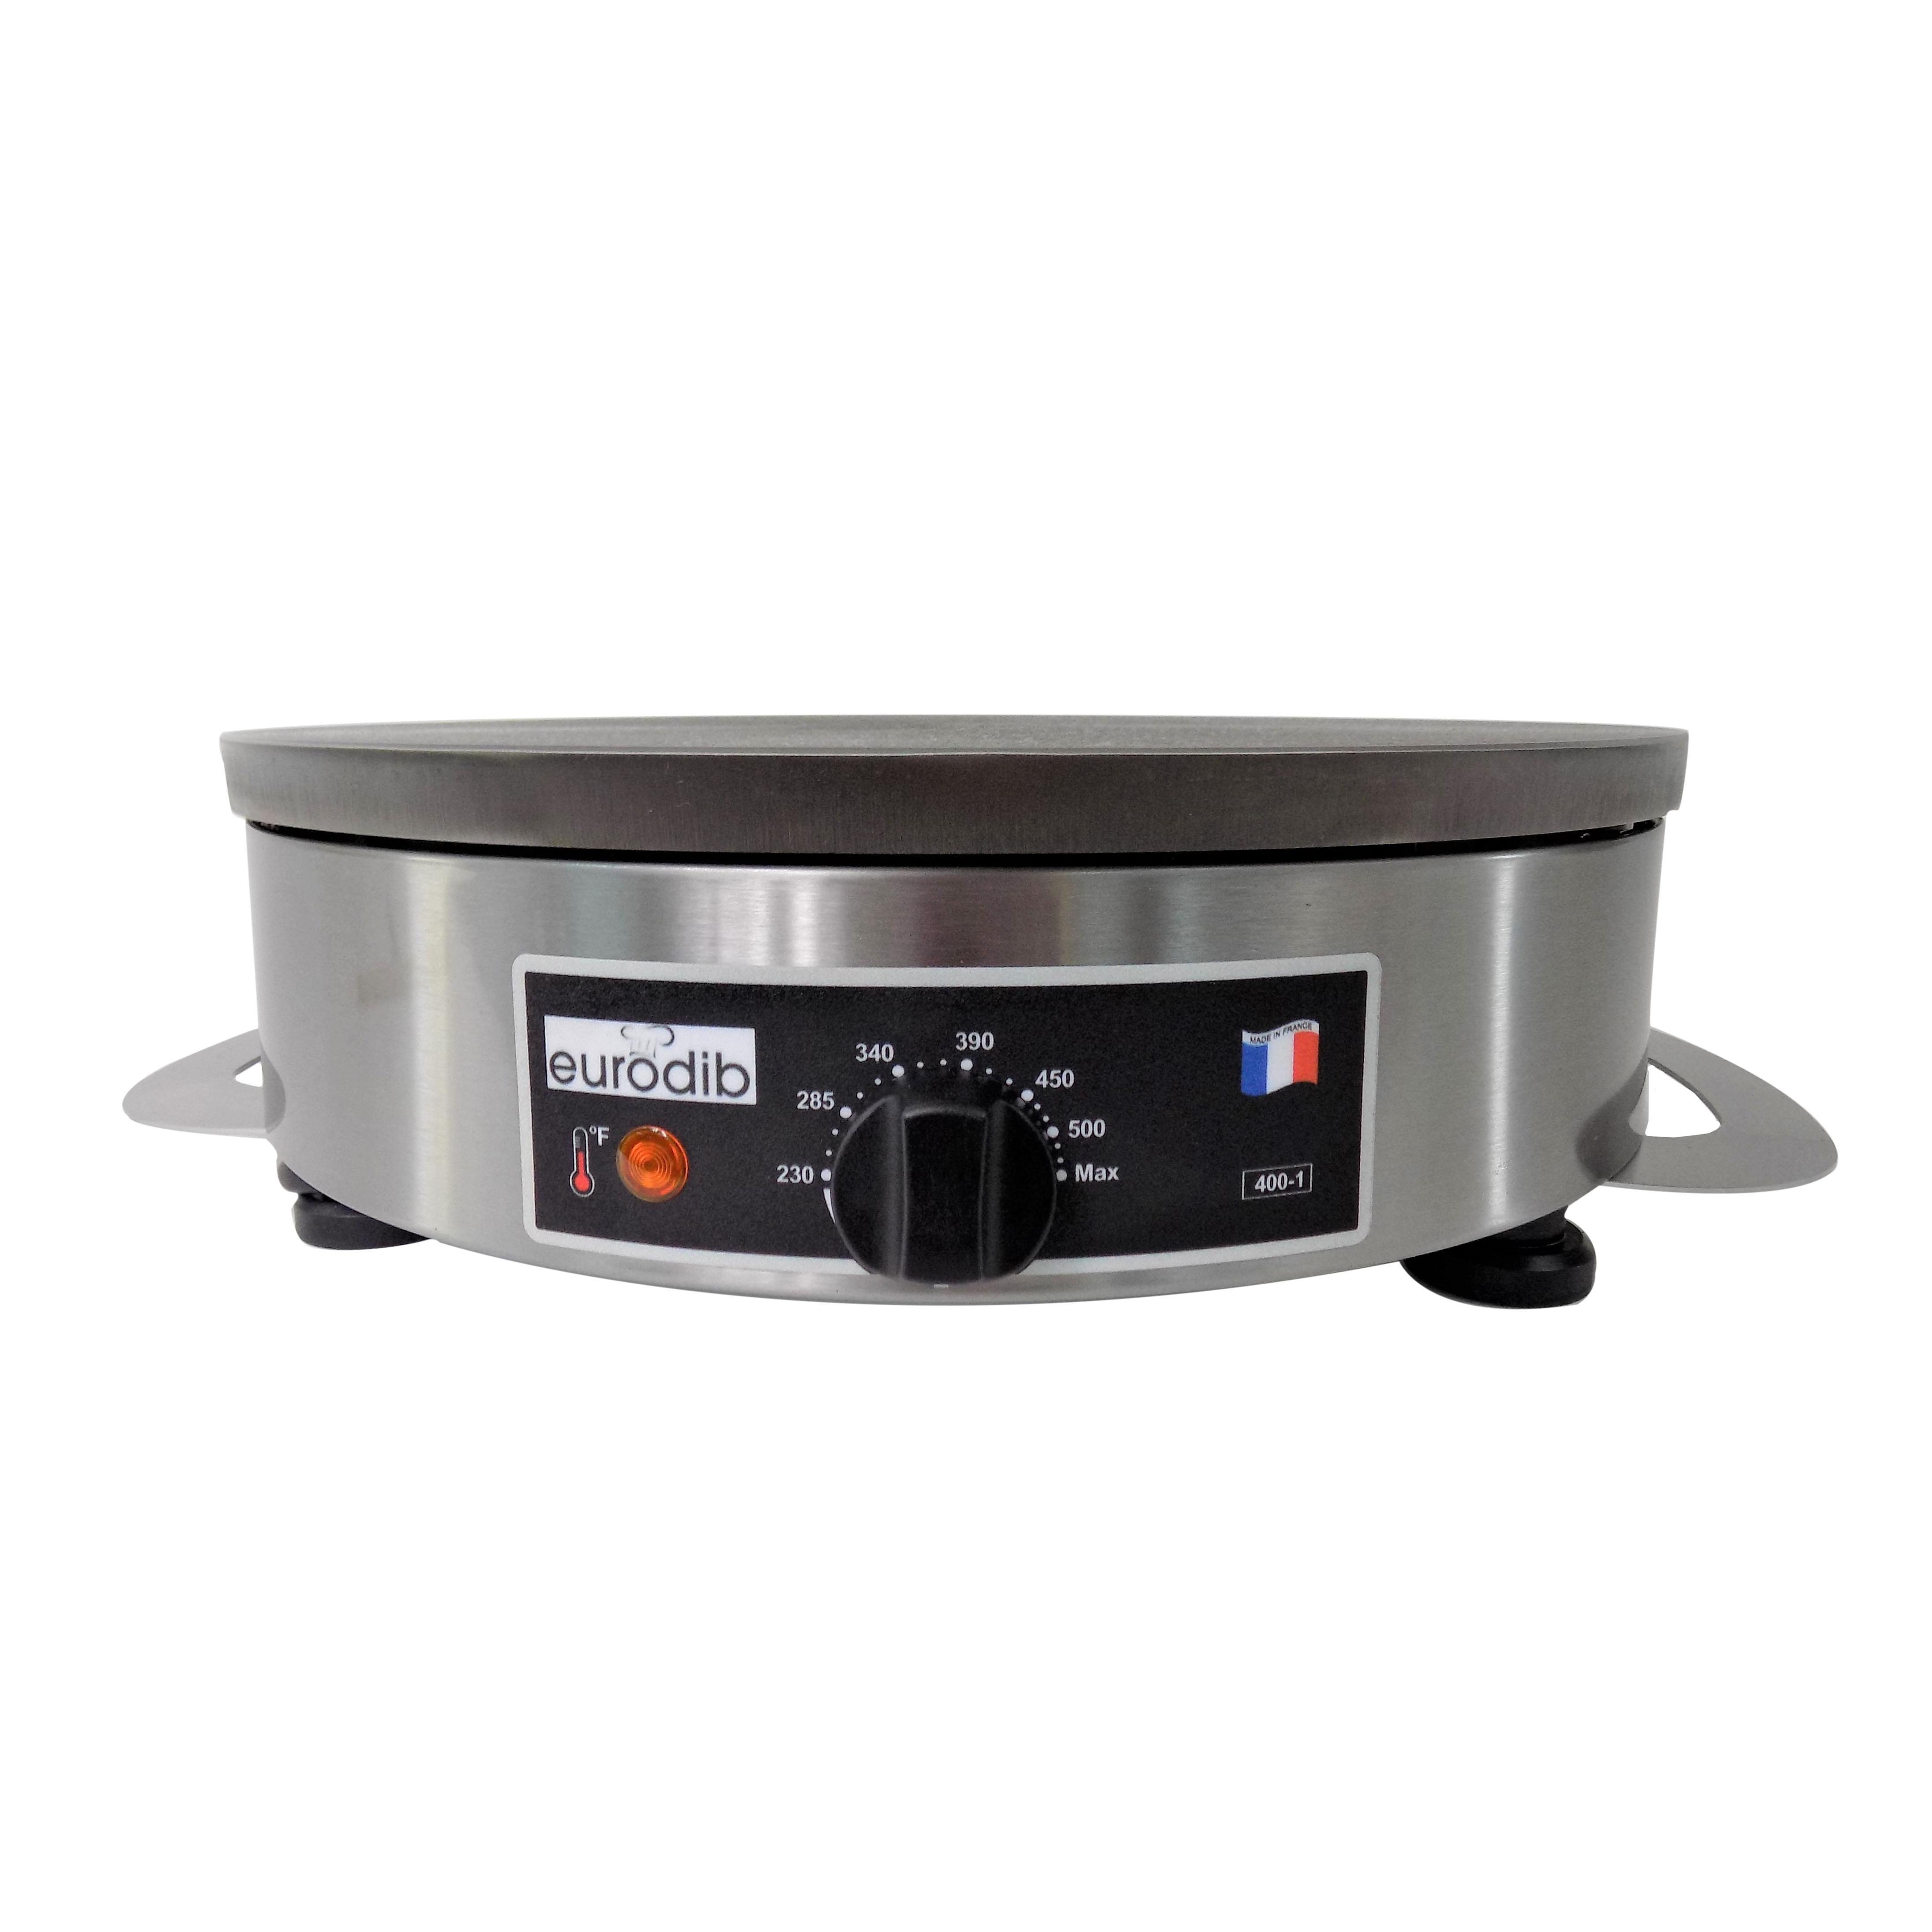 Eurodib USA CEEB42-208 crepe maker